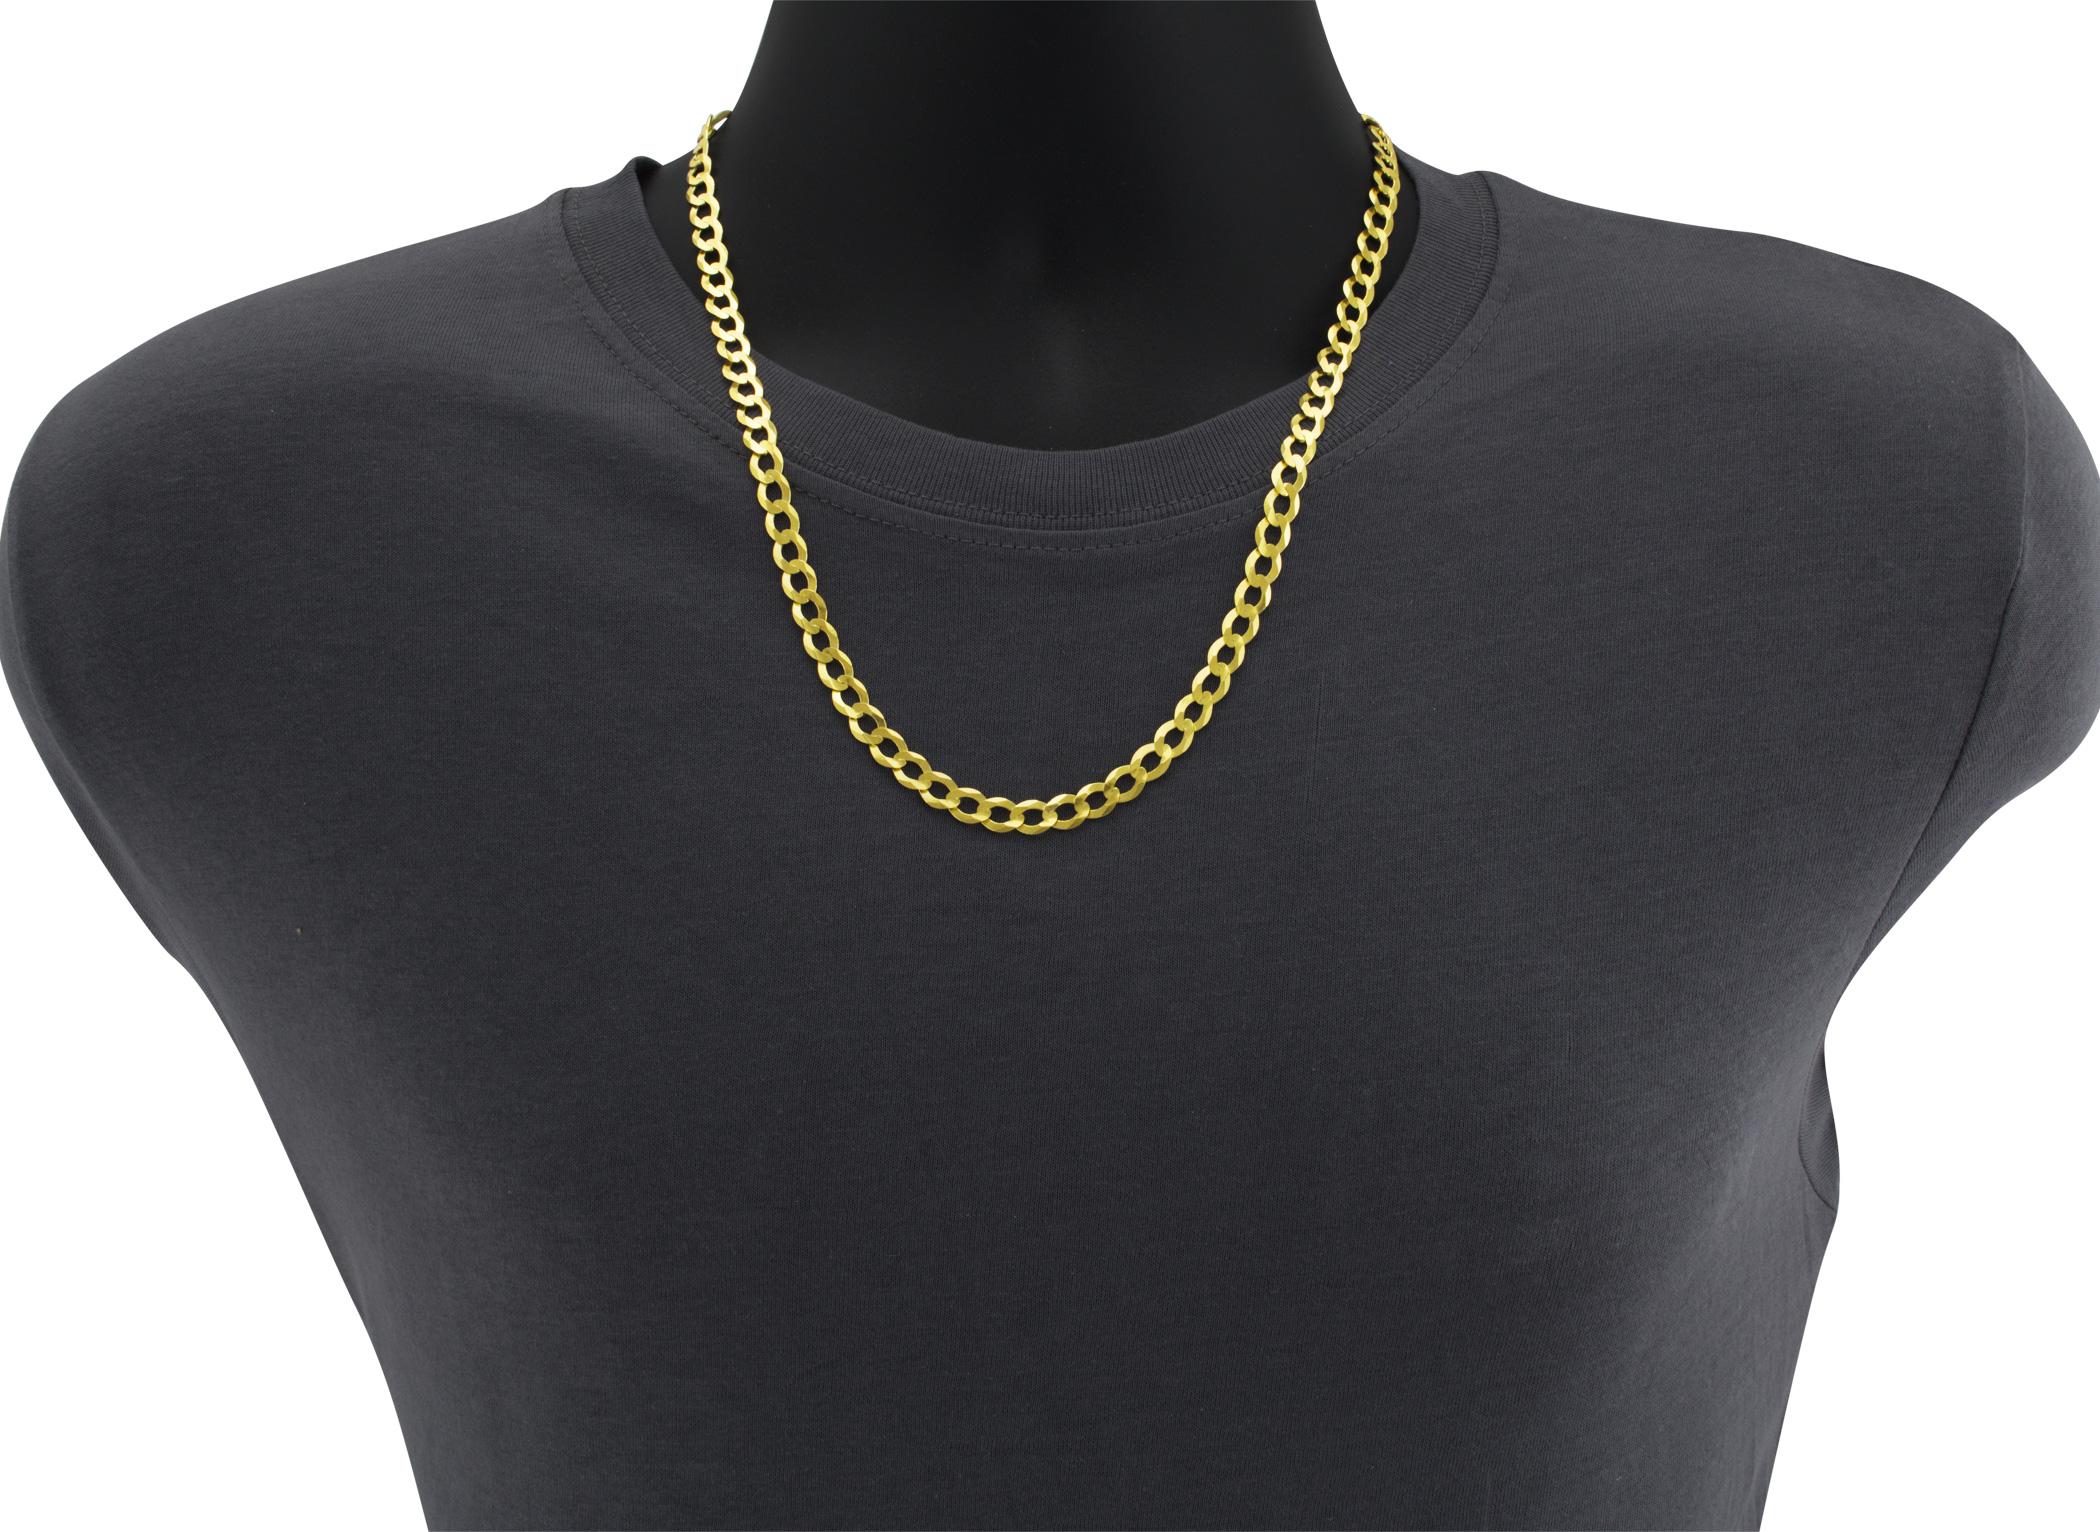 10K-Solid-Yellow-Gold-2mm-12mm-Cuban-Curb-Link-Chain-Bracelet-Men-Women-7-034-8-034-9-034 thumbnail 15